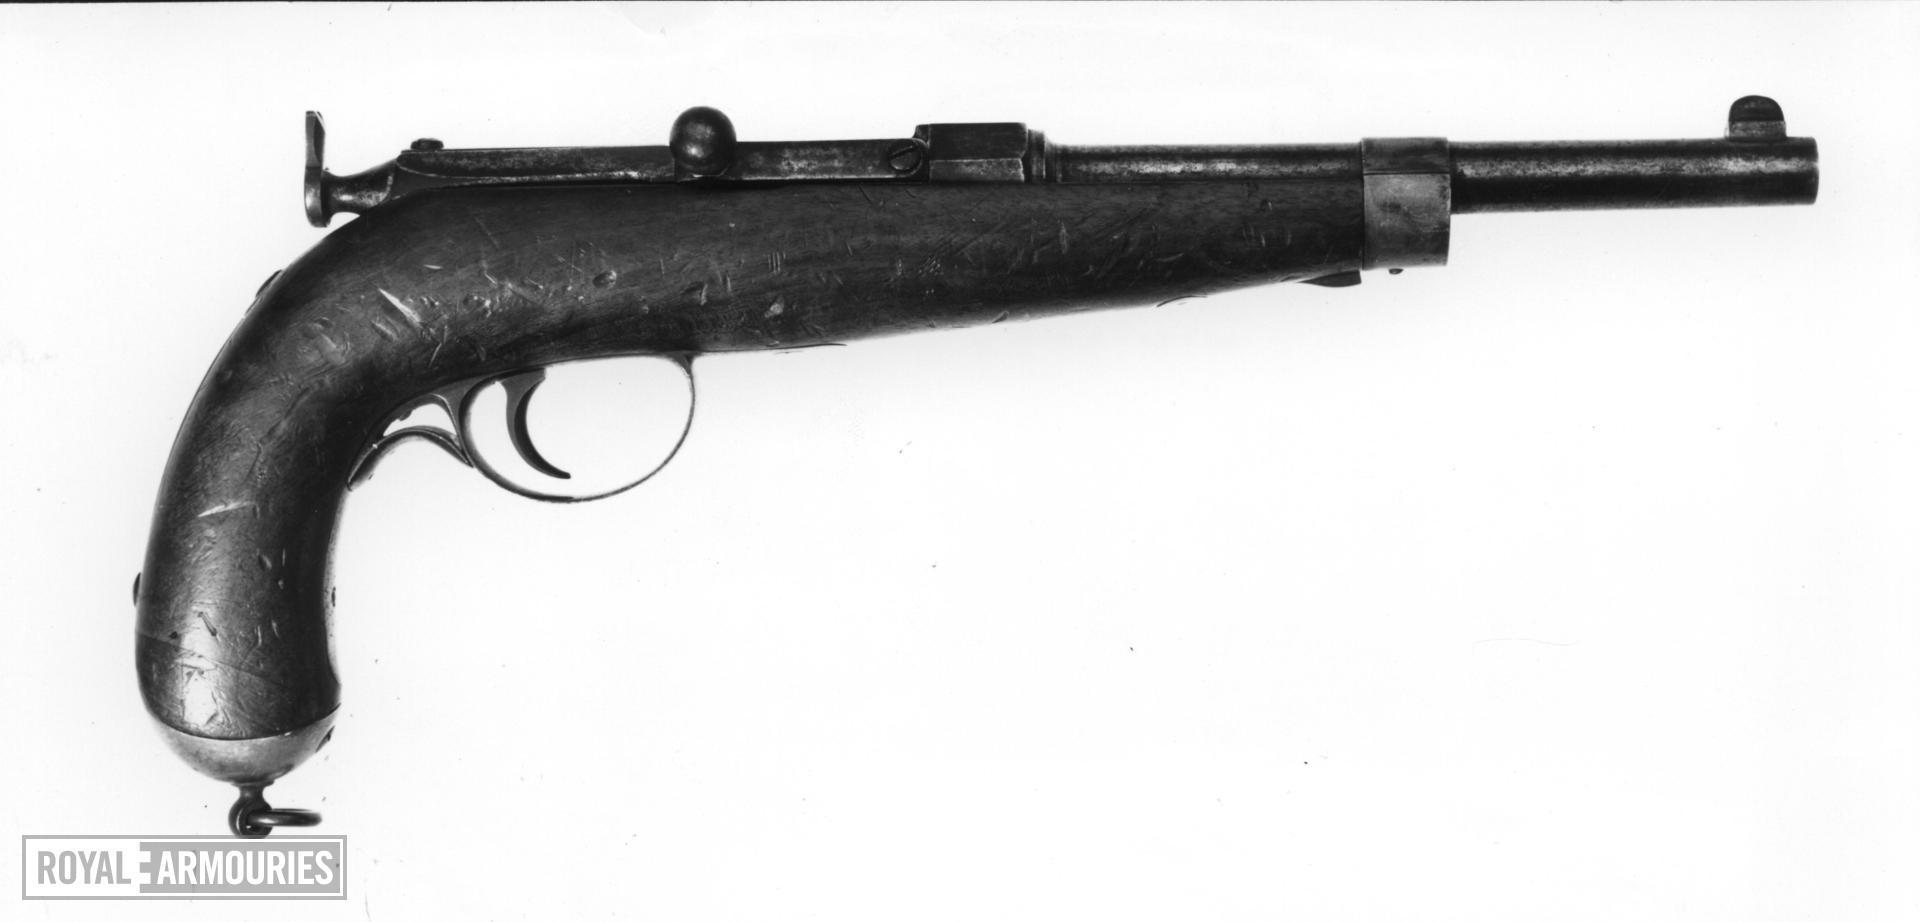 Centrefire bolt-action military pistol - Berdan Patent